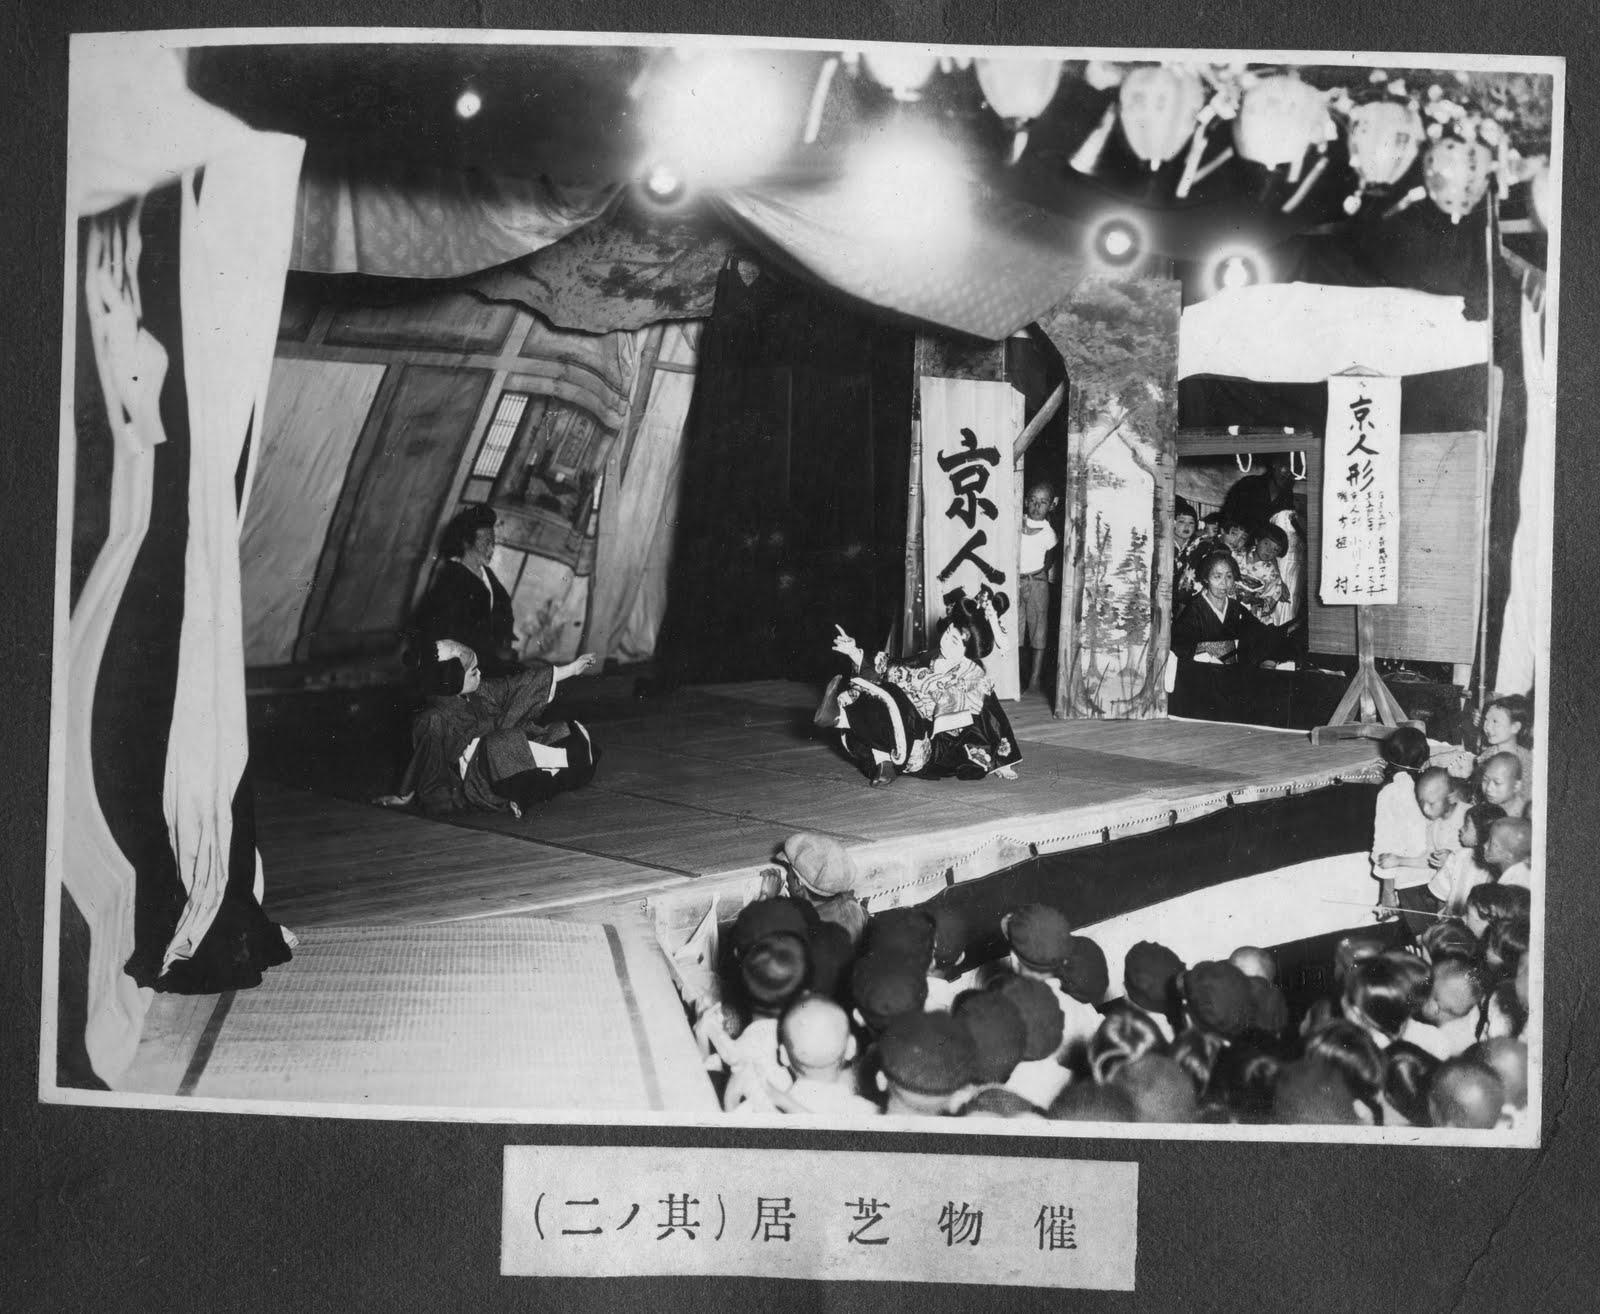 Photo: 慶祝落成戲劇表演之二